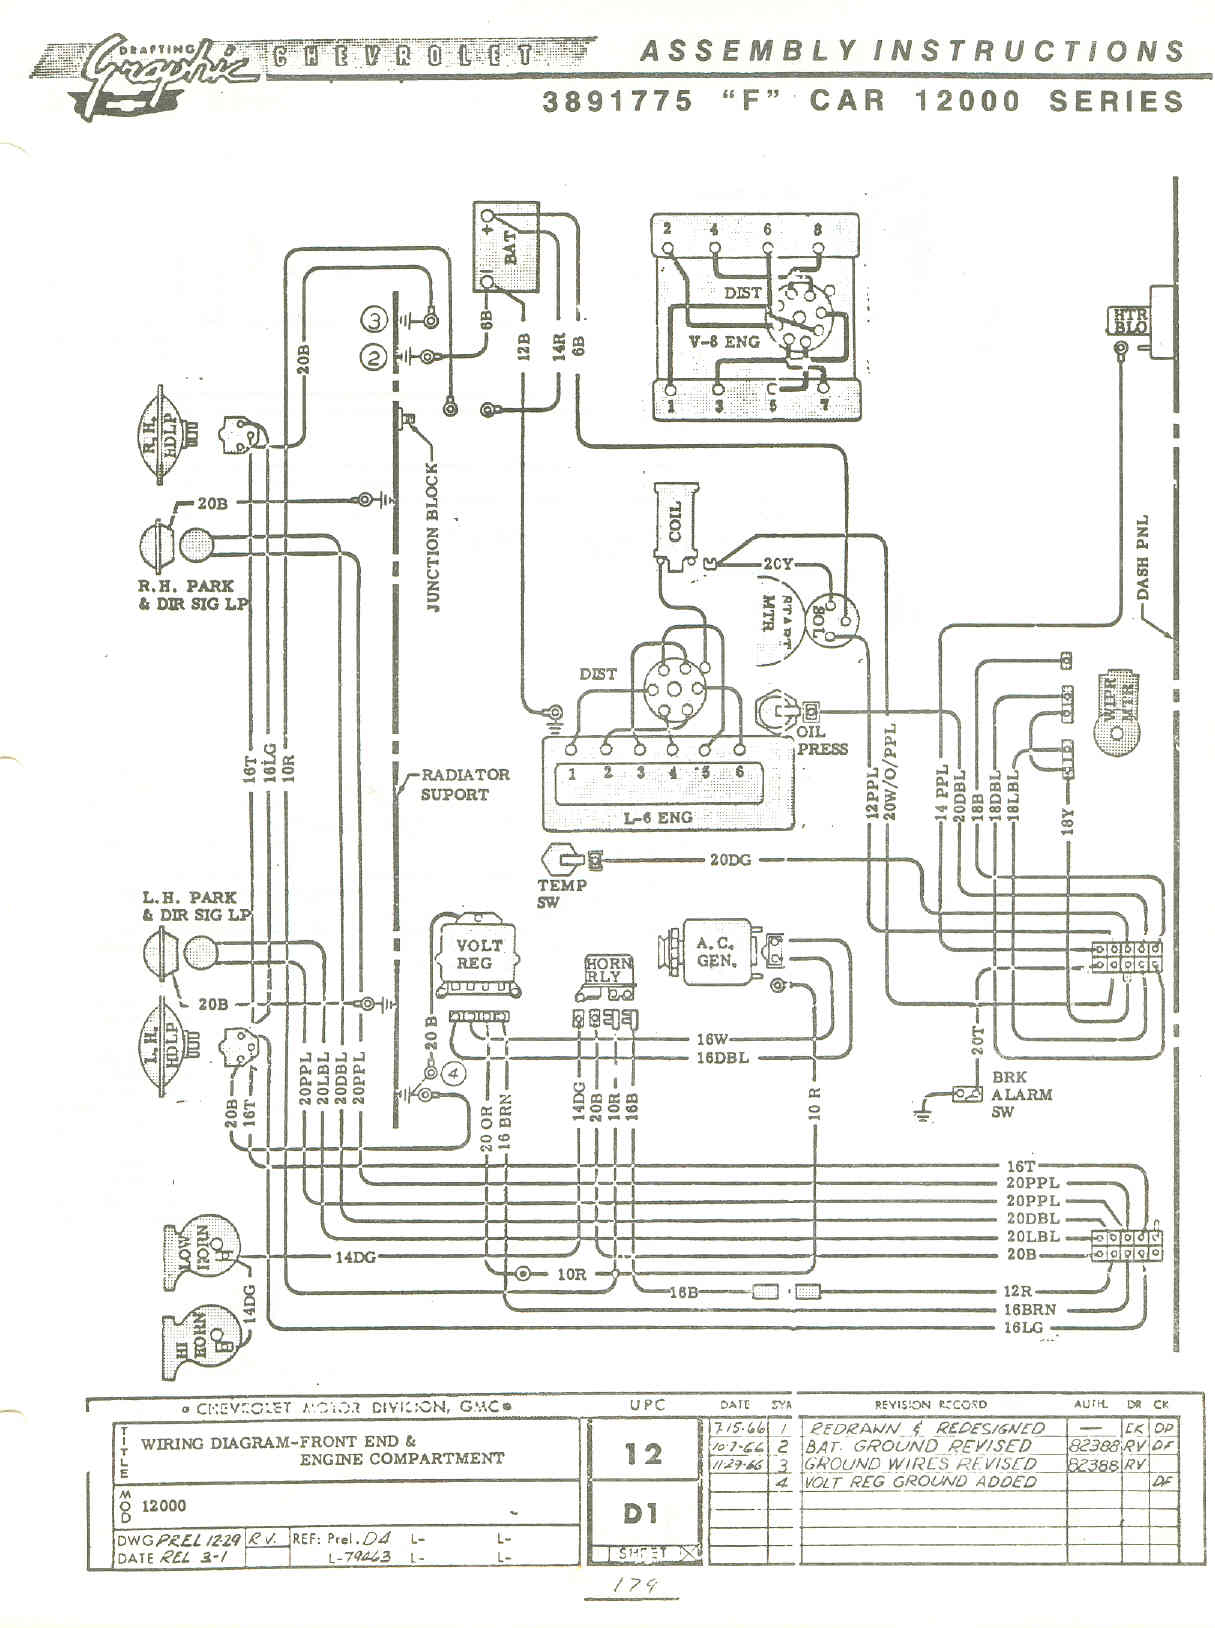 Wonderful 1969 ford mustang engine wiring diagram images best great 89 mustang alternator wiring diagram gallery the best wiring diagram 69 camaro swarovskicordoba Gallery